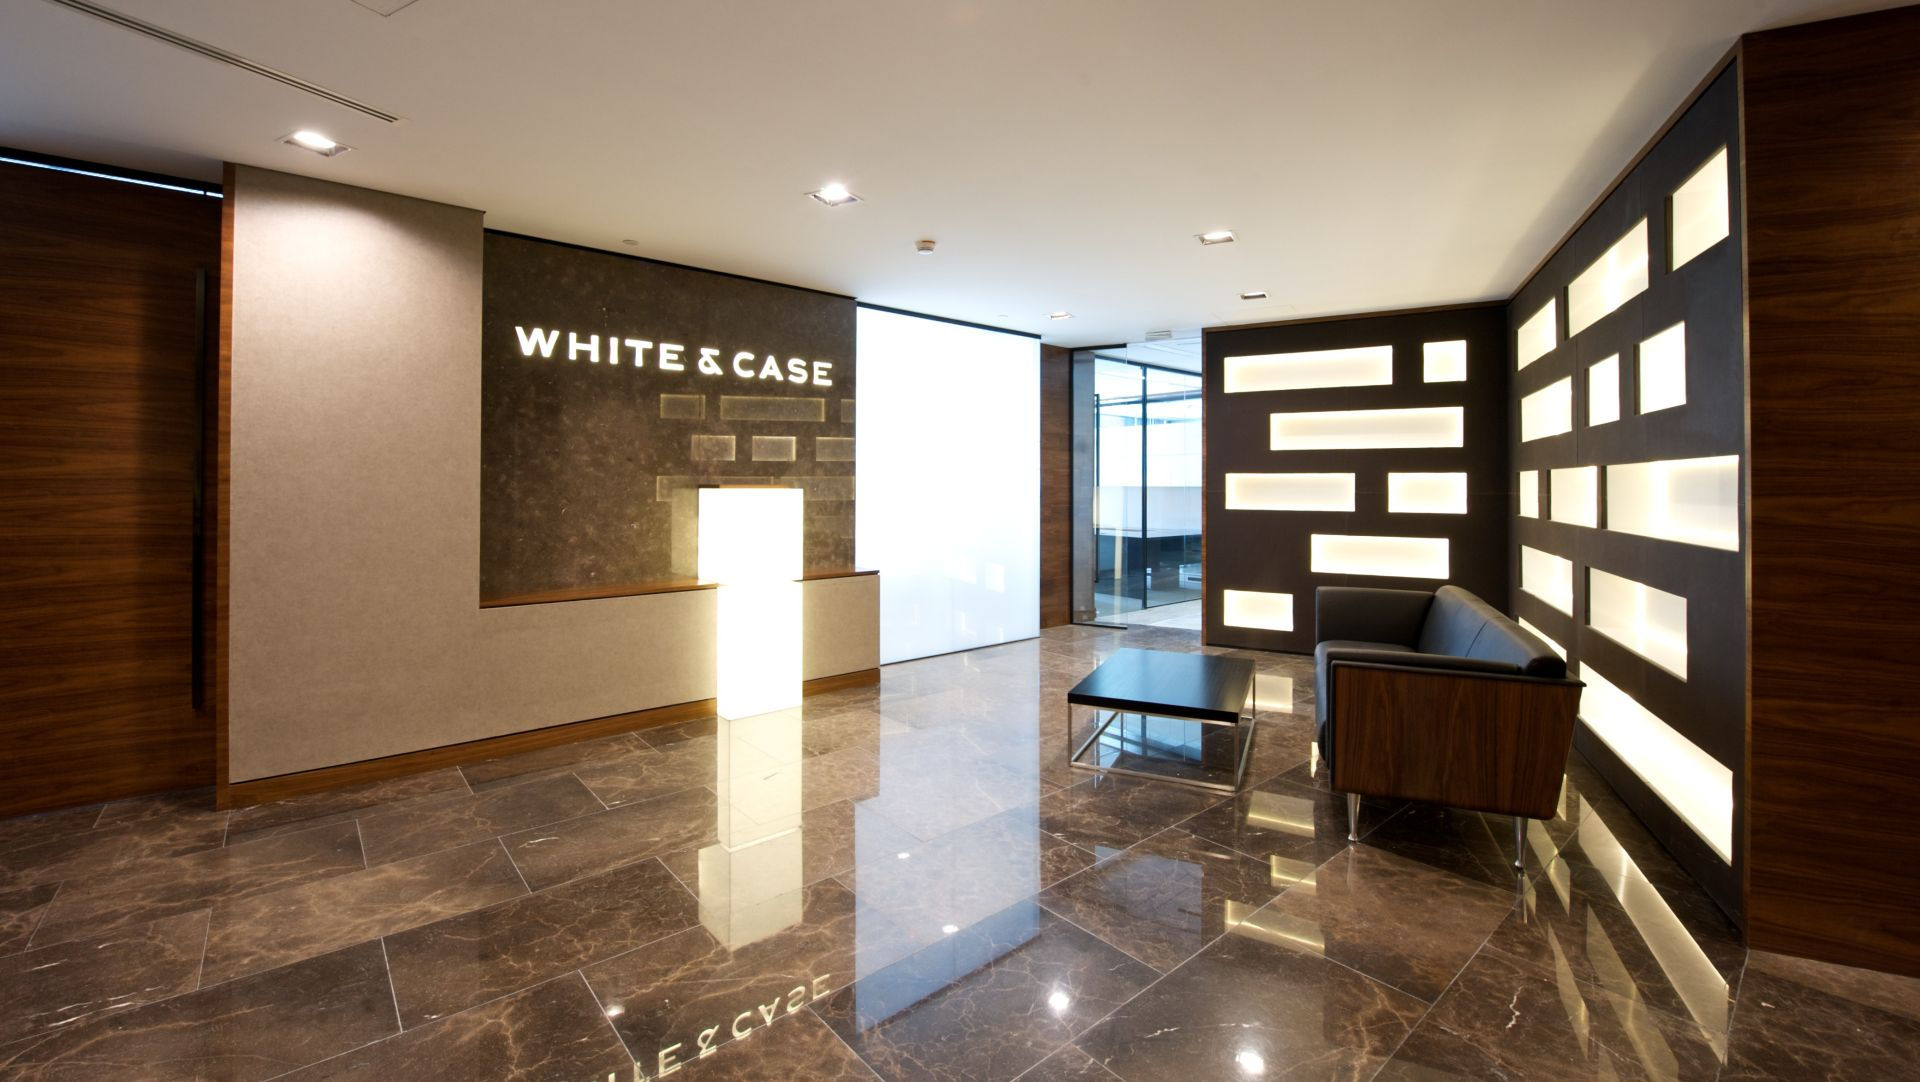 Law Firm/Legal Services Designs: White & Case LLP - Dubai - Love That Design